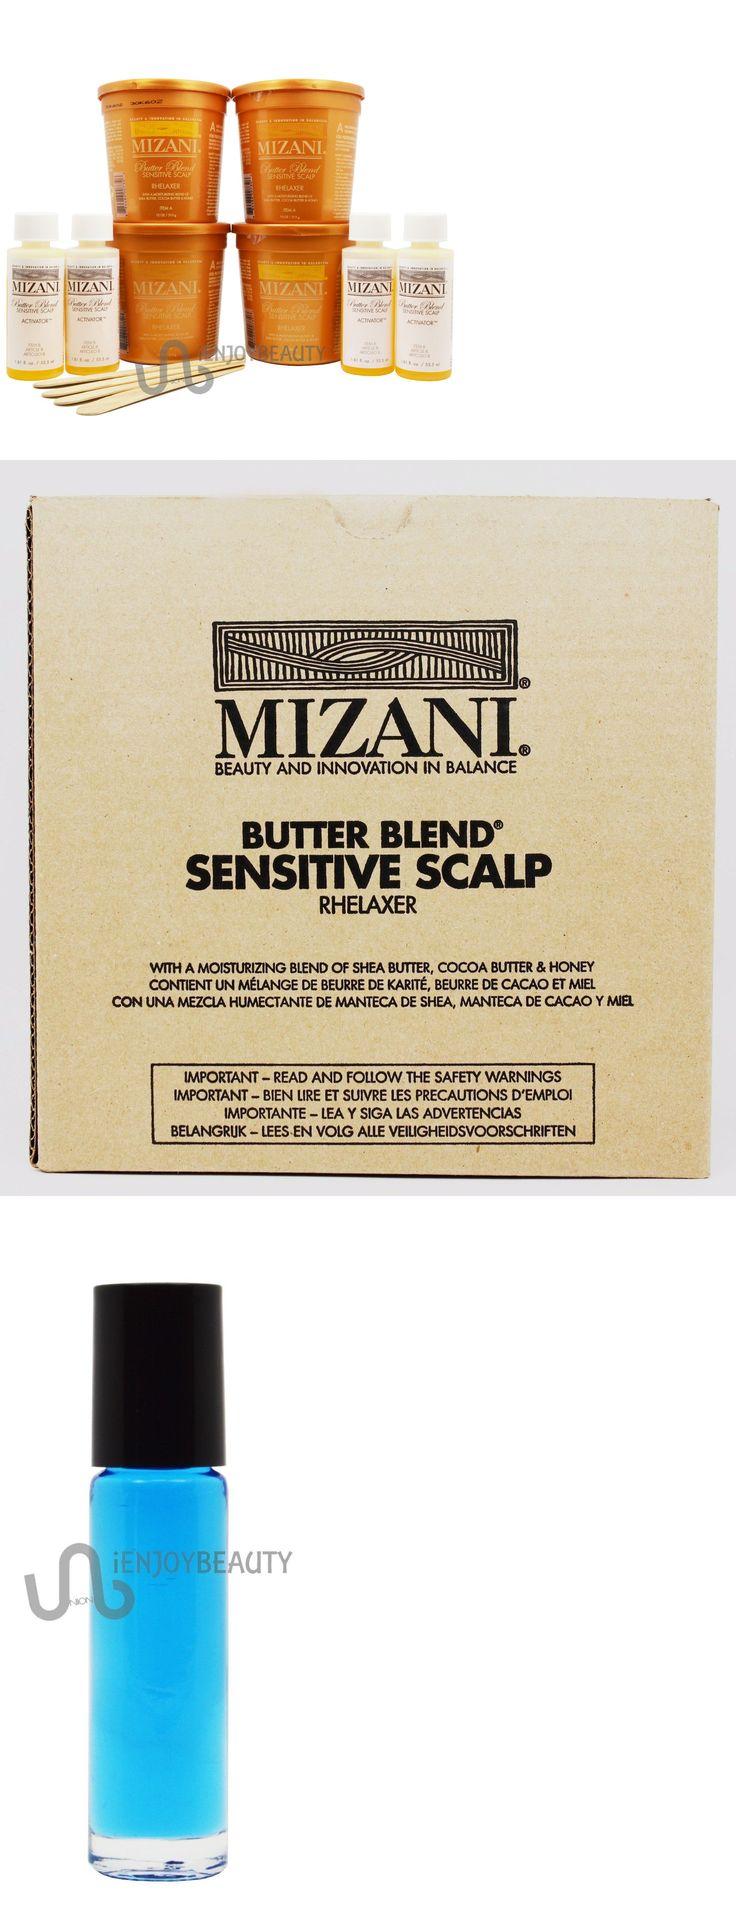 Sets and Kits: Mizani Butter Blend Sensitive Scalp Rhelaxer 4 Applications Kit W Free Body Oil -> BUY IT NOW ONLY: $34.99 on eBay!